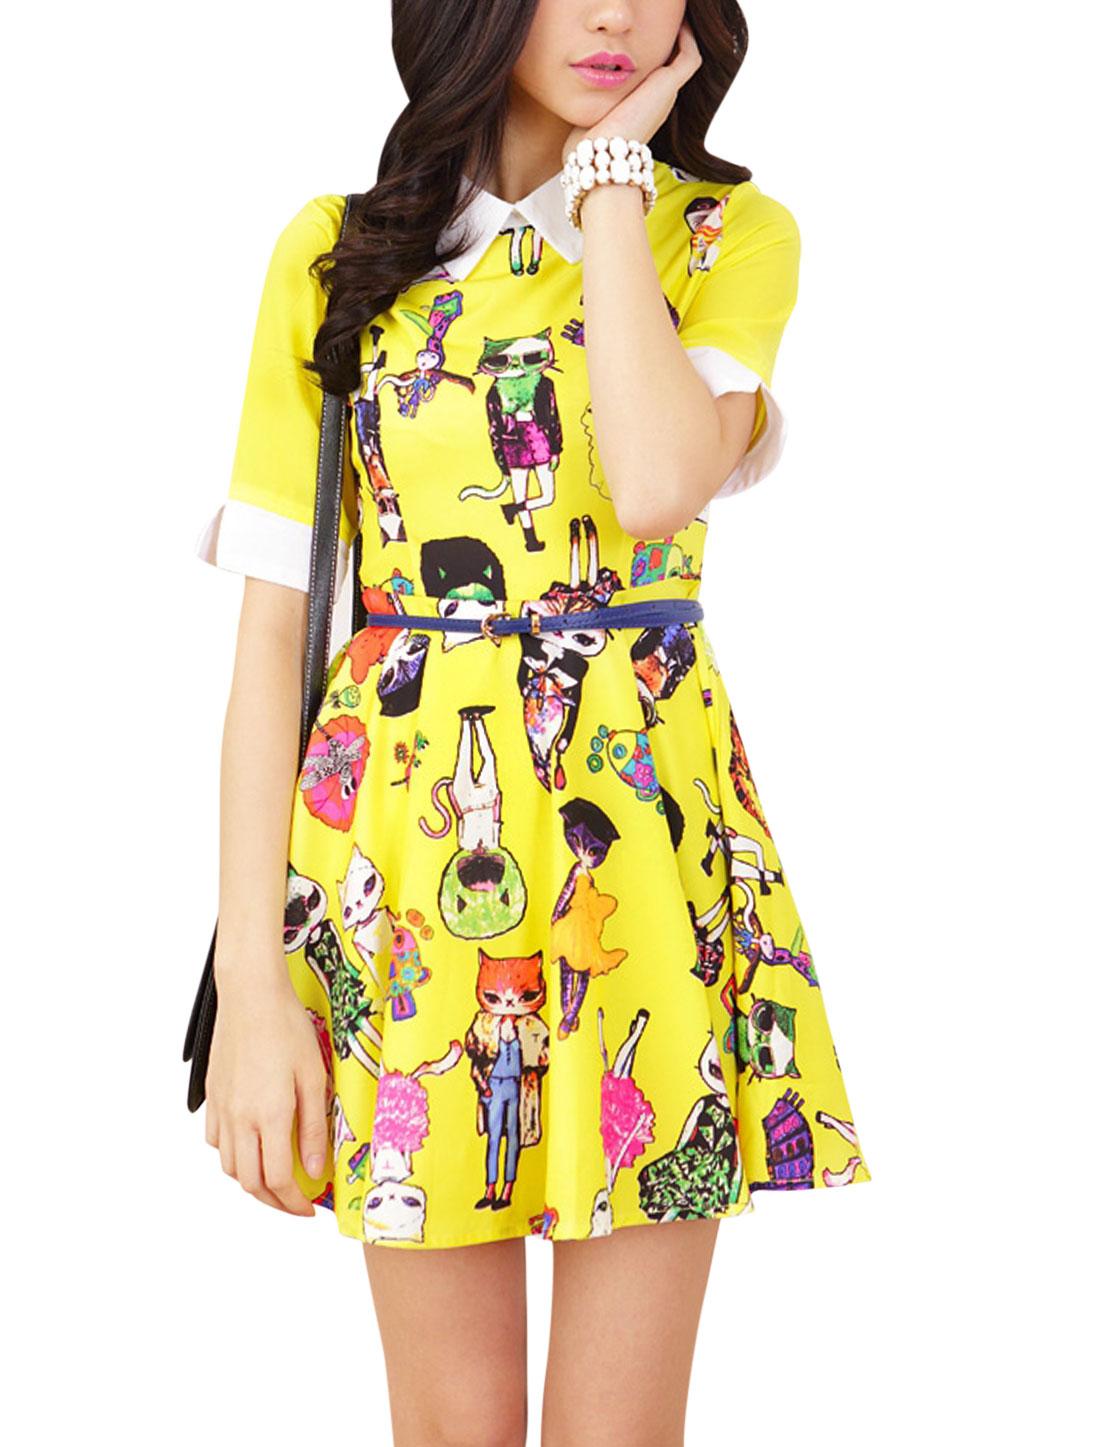 Lady Doll Collar Short Sleeve Split Cuffs Cartoon Prints Dress Yellow M